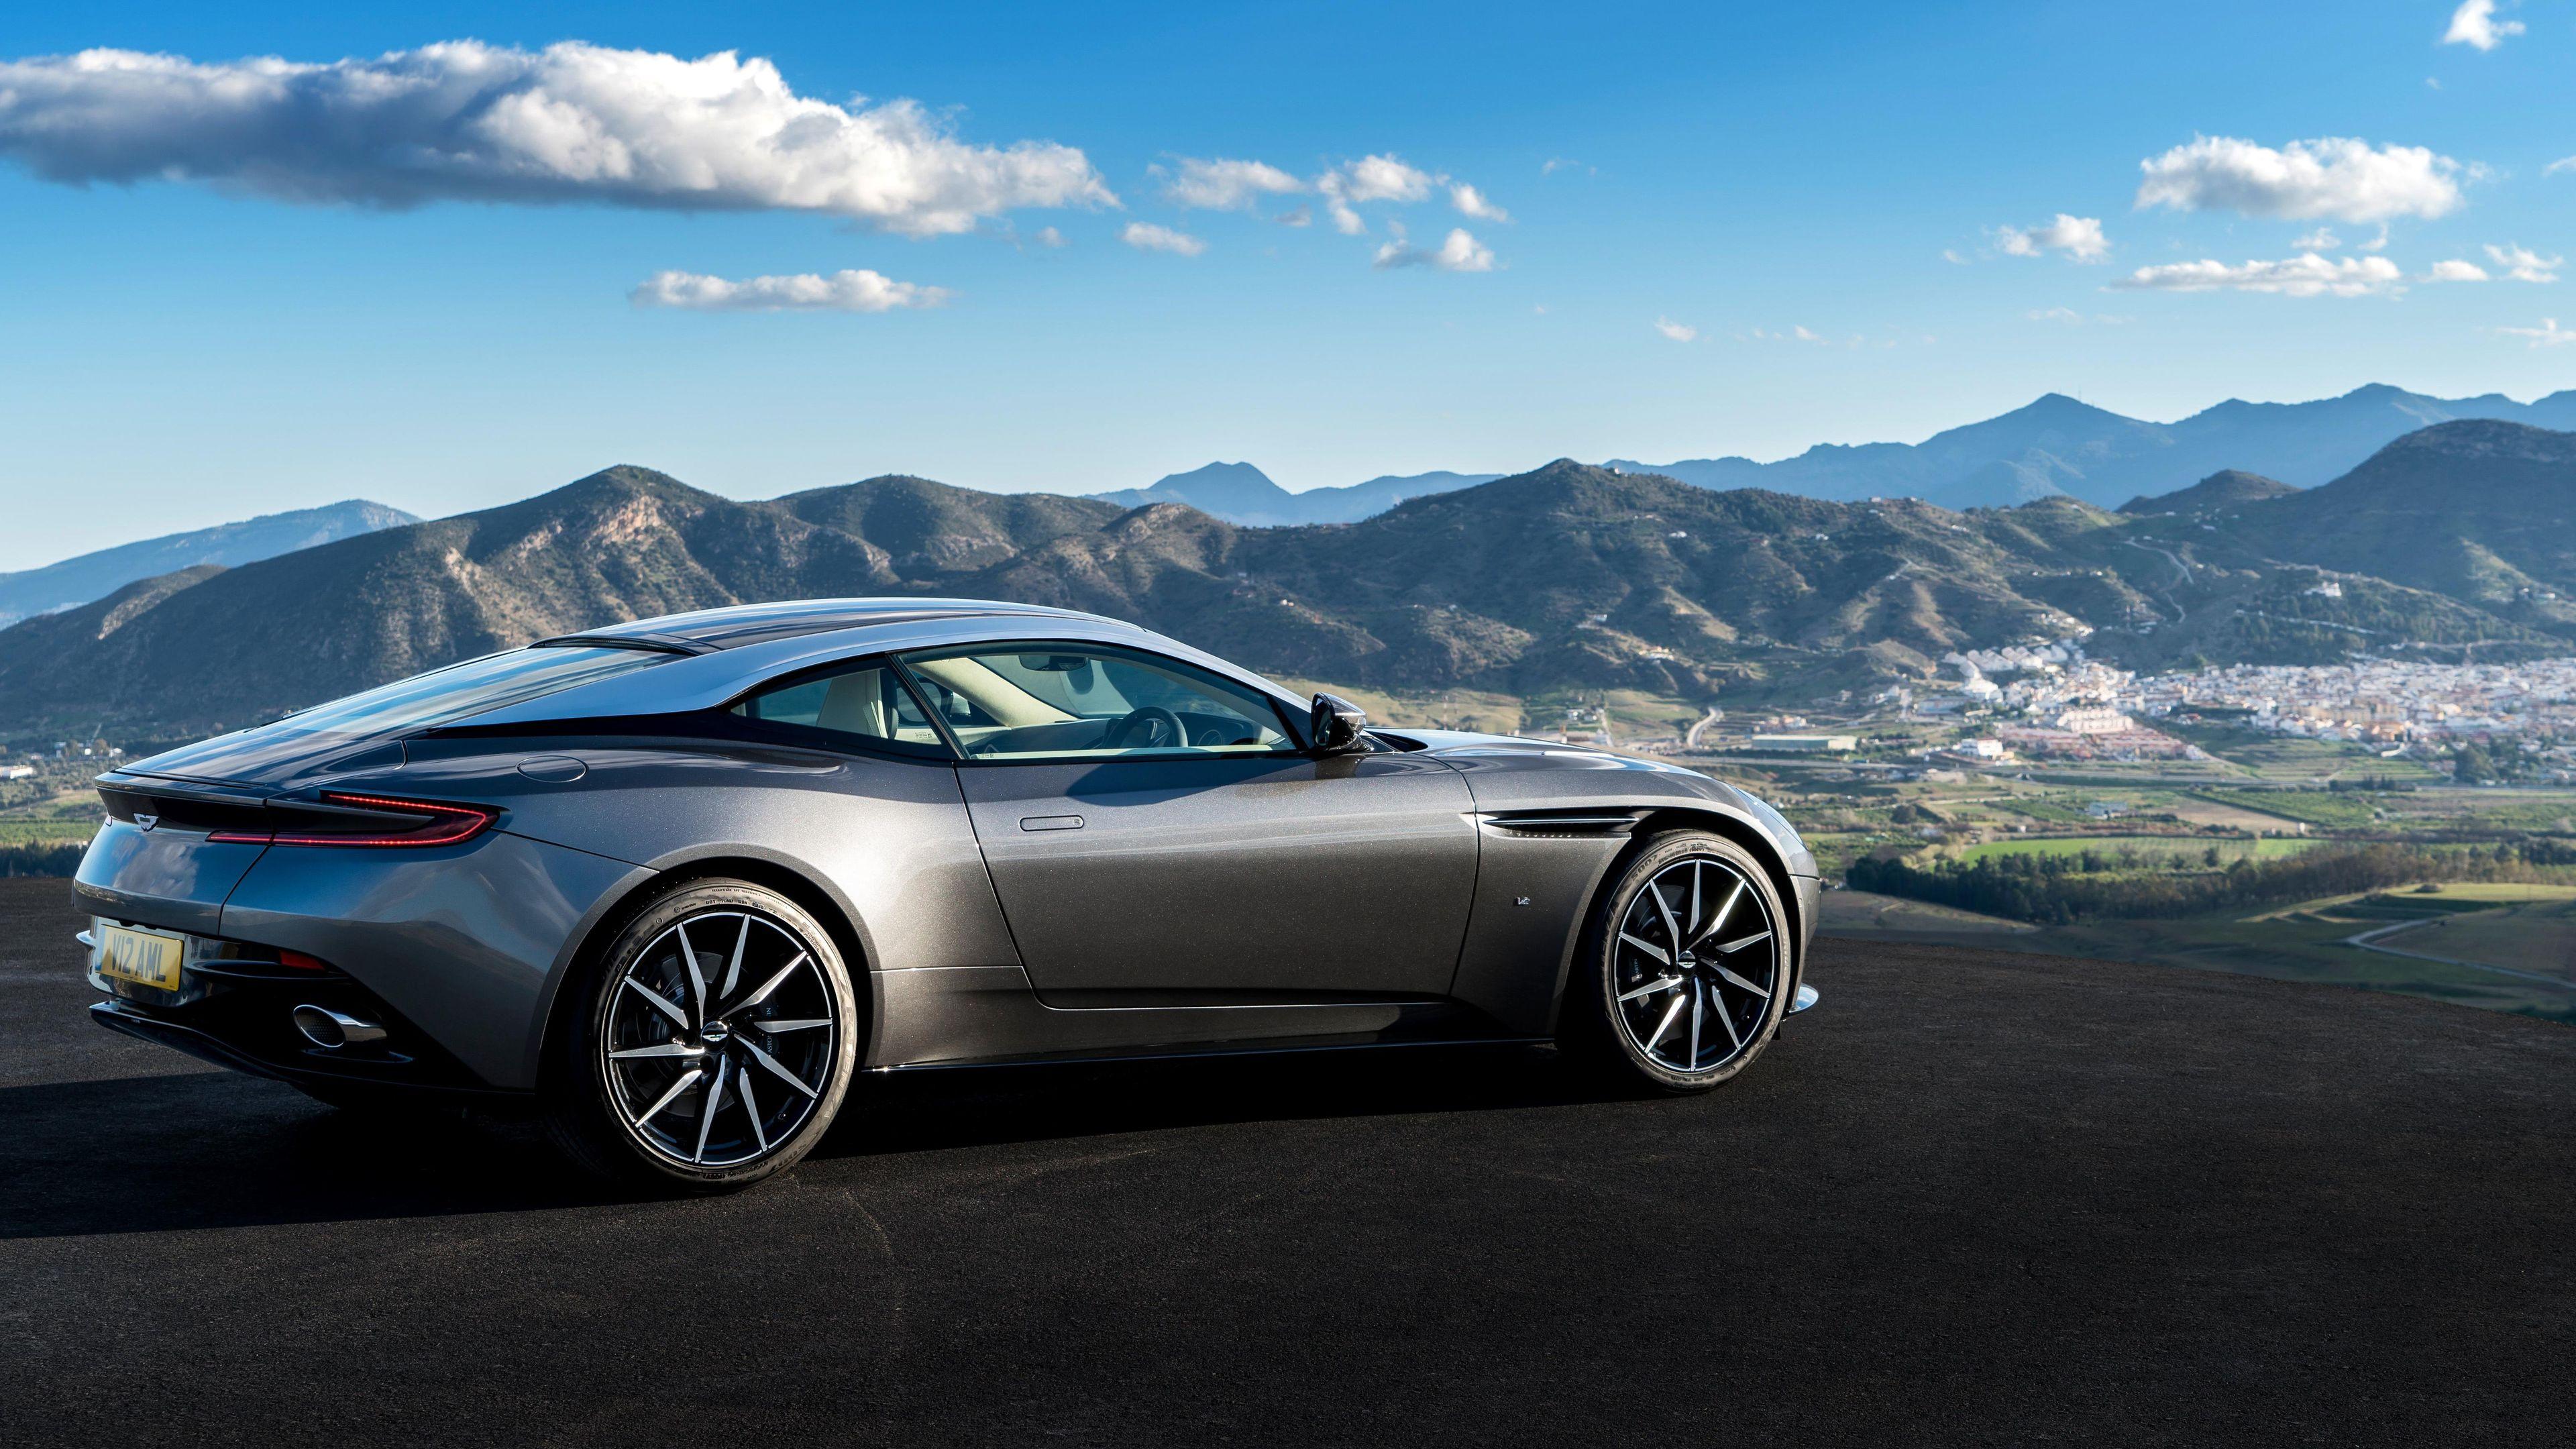 aston martin 4k 1556185324 - Aston Martin 4k - hd-wallpapers, cars wallpapers, aston martin wallpapers, 8k wallpapers, 5k wallpapers, 4k-wallpapers